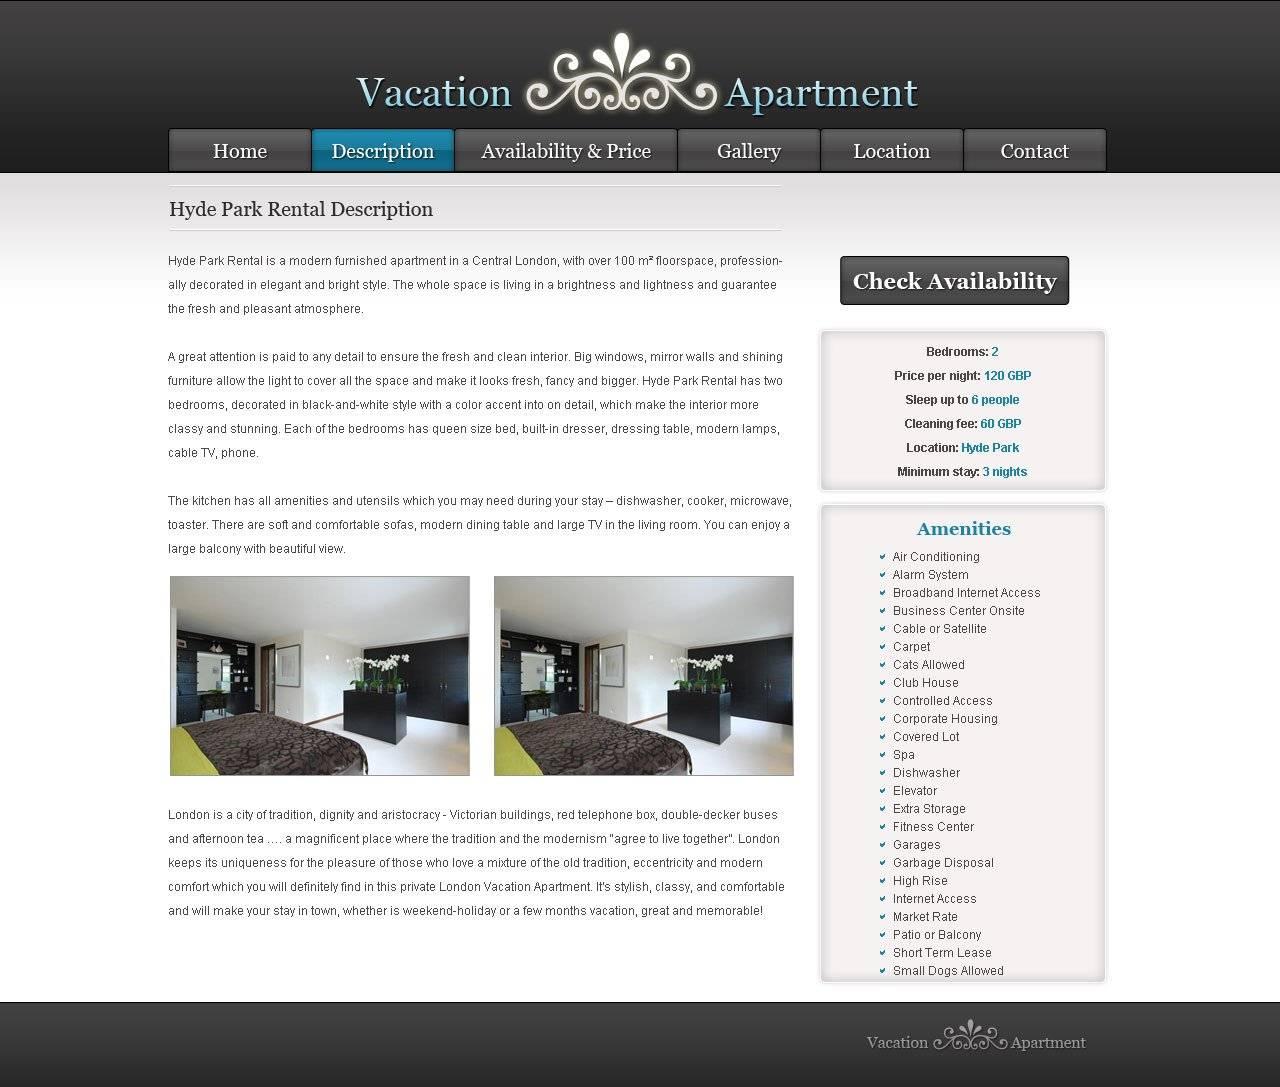 Vacation Rental Website Templates Free